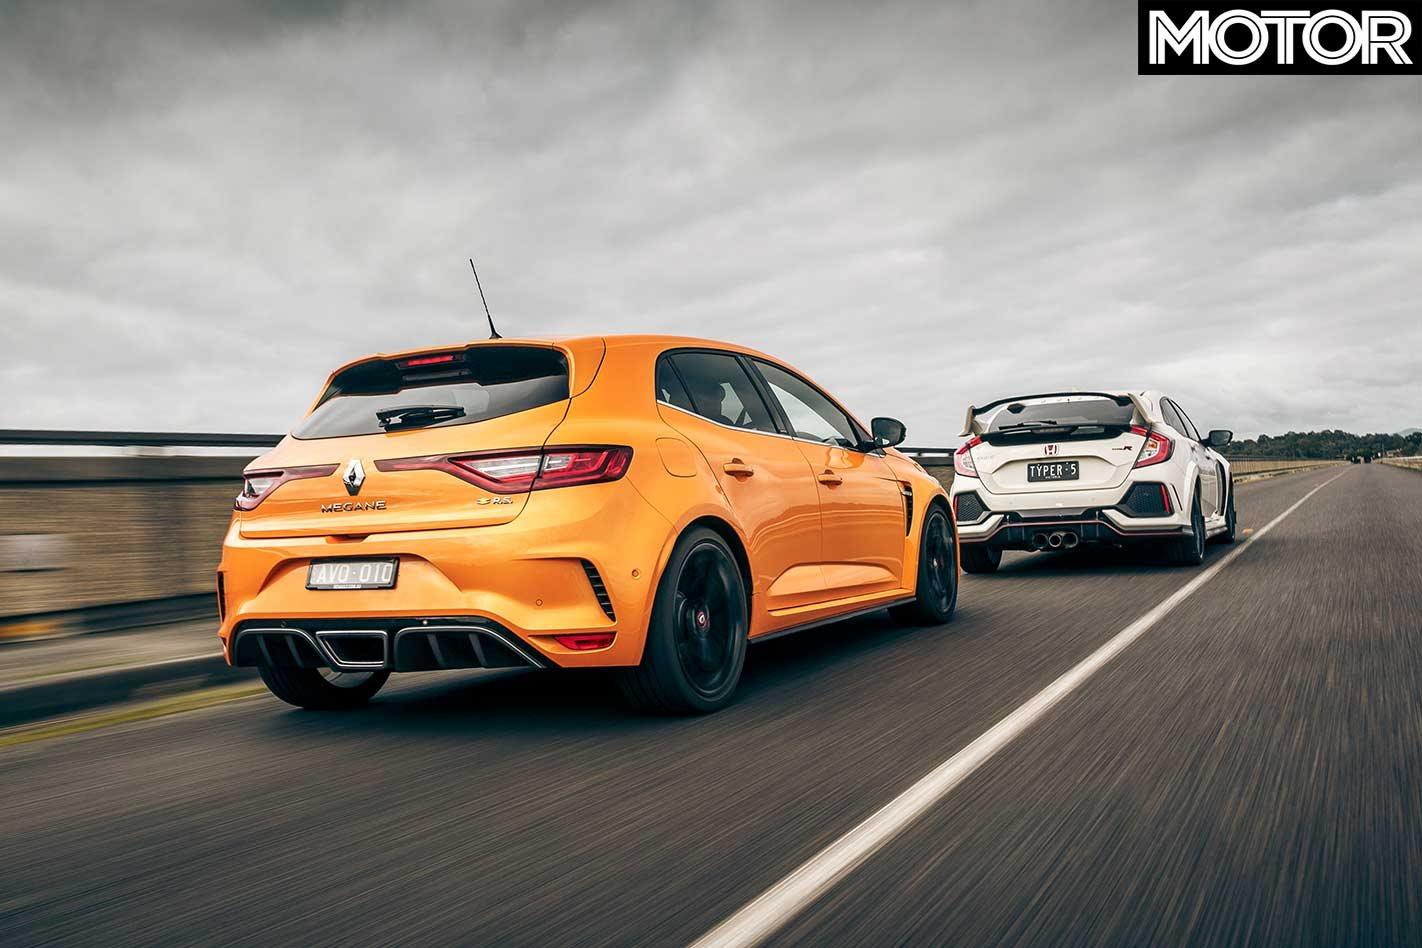 2018 Renault Mégane RS 280 vs Honda Civic Type R vs Hyundai i30 N vs